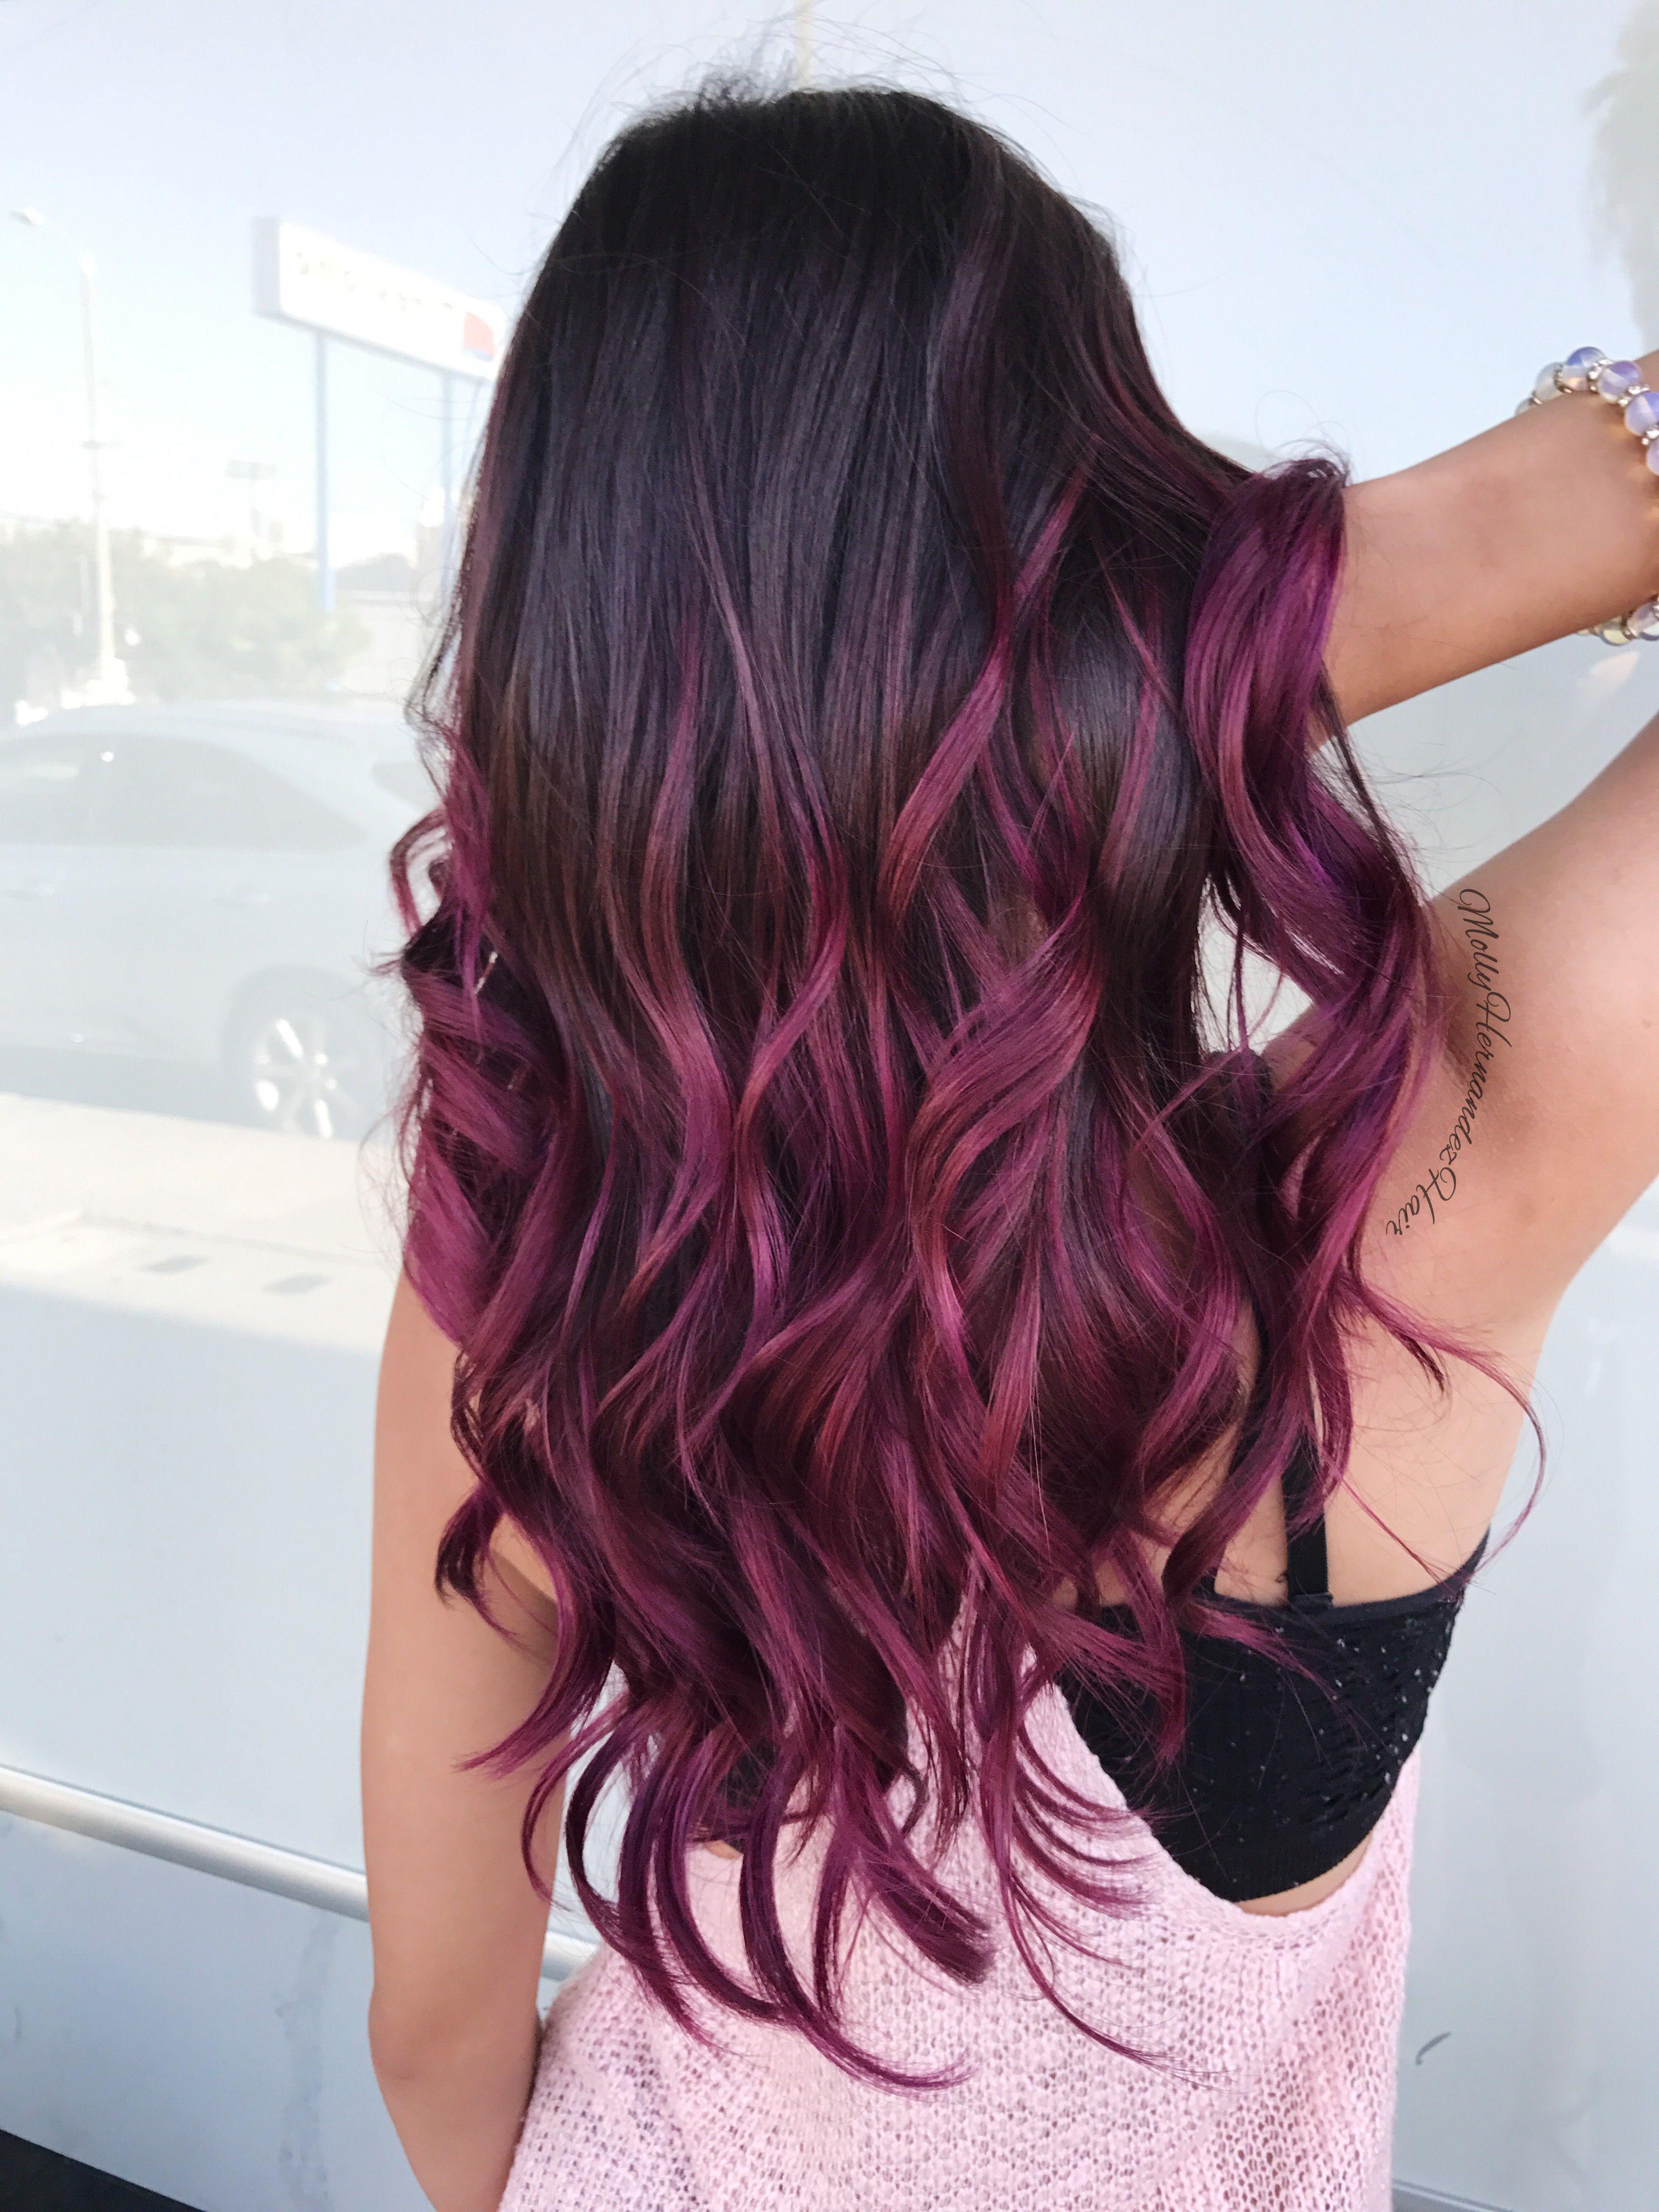 Burgundy ombré, purple \u0026 magenta balayage, hair goals